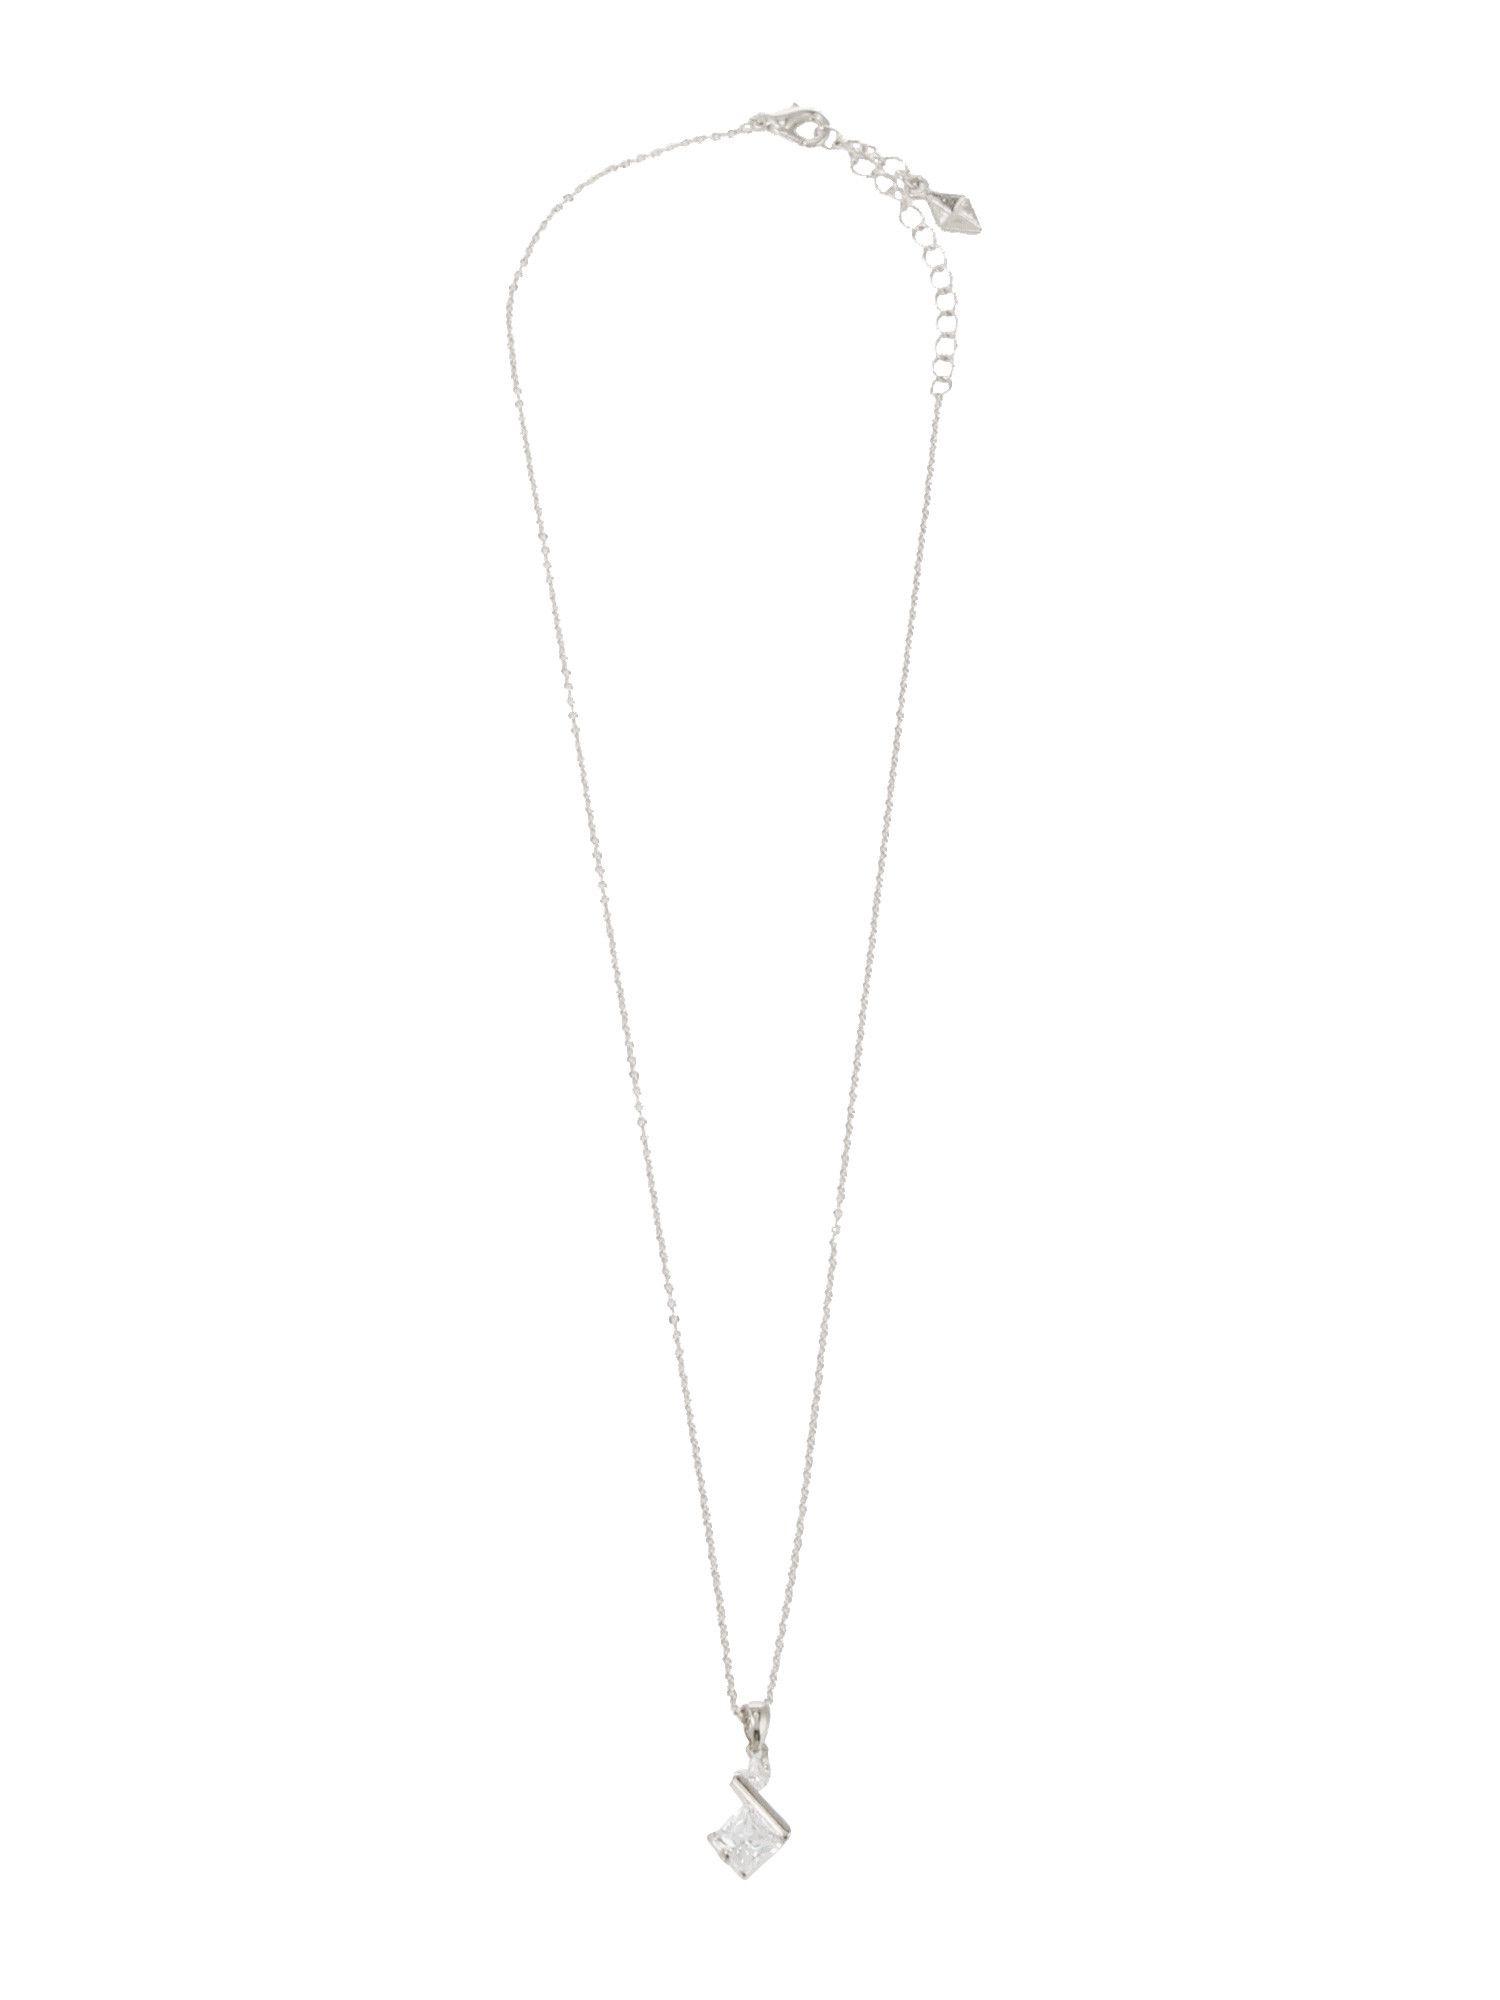 Bijou point necklace